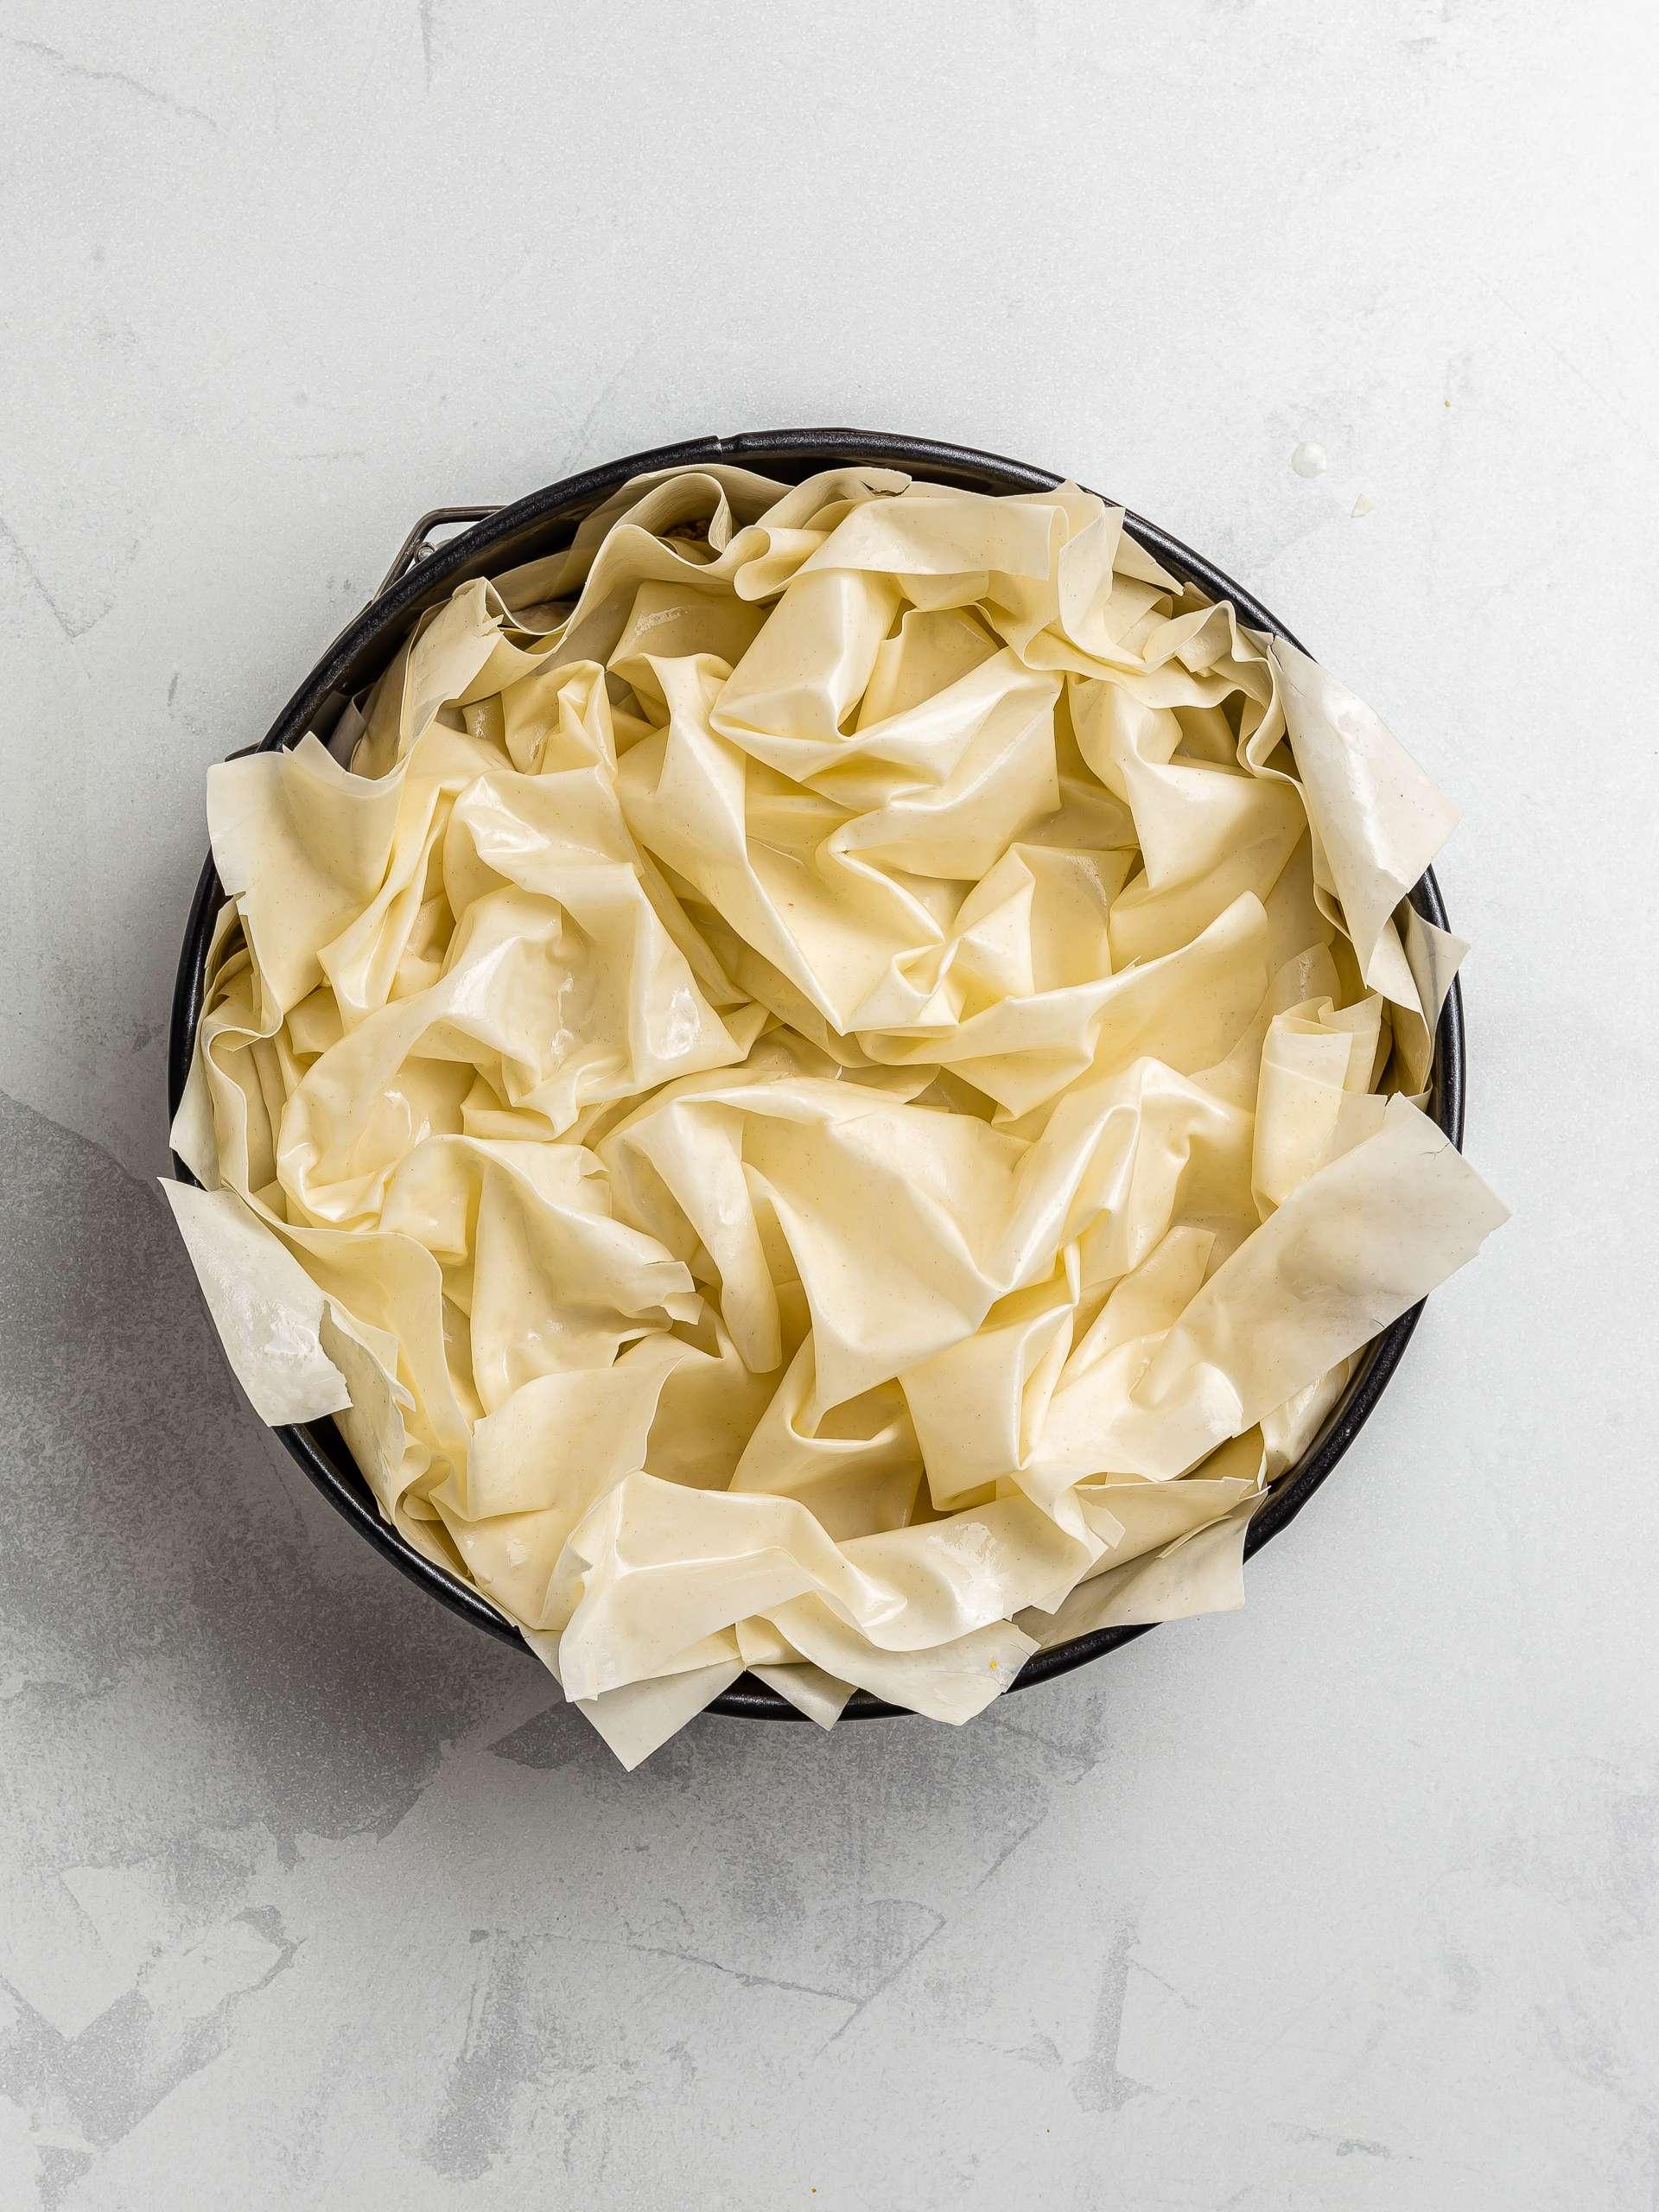 filo pie with crumpled filo sheets